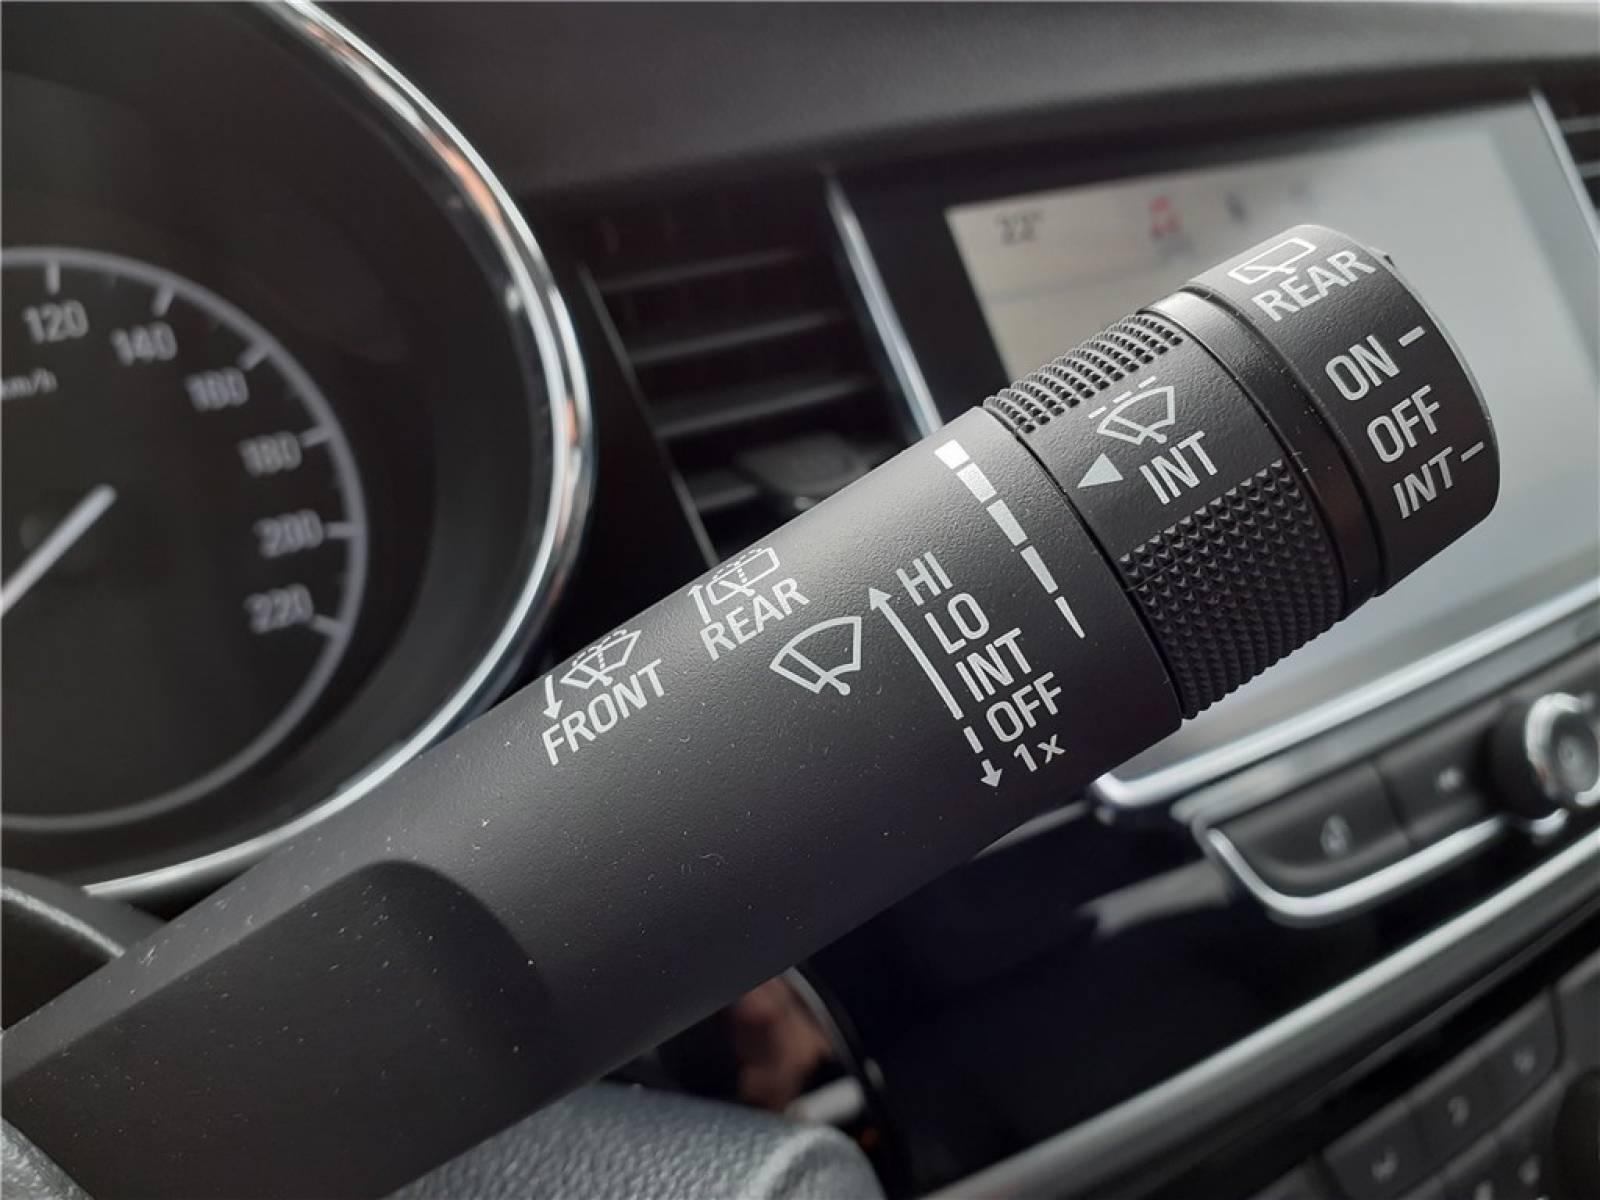 OPEL Mokka X 1.6 CDTI - 136 ch 4x2 - véhicule d'occasion - Groupe Guillet - Opel Magicauto - Chalon-sur-Saône - 71380 - Saint-Marcel - 15